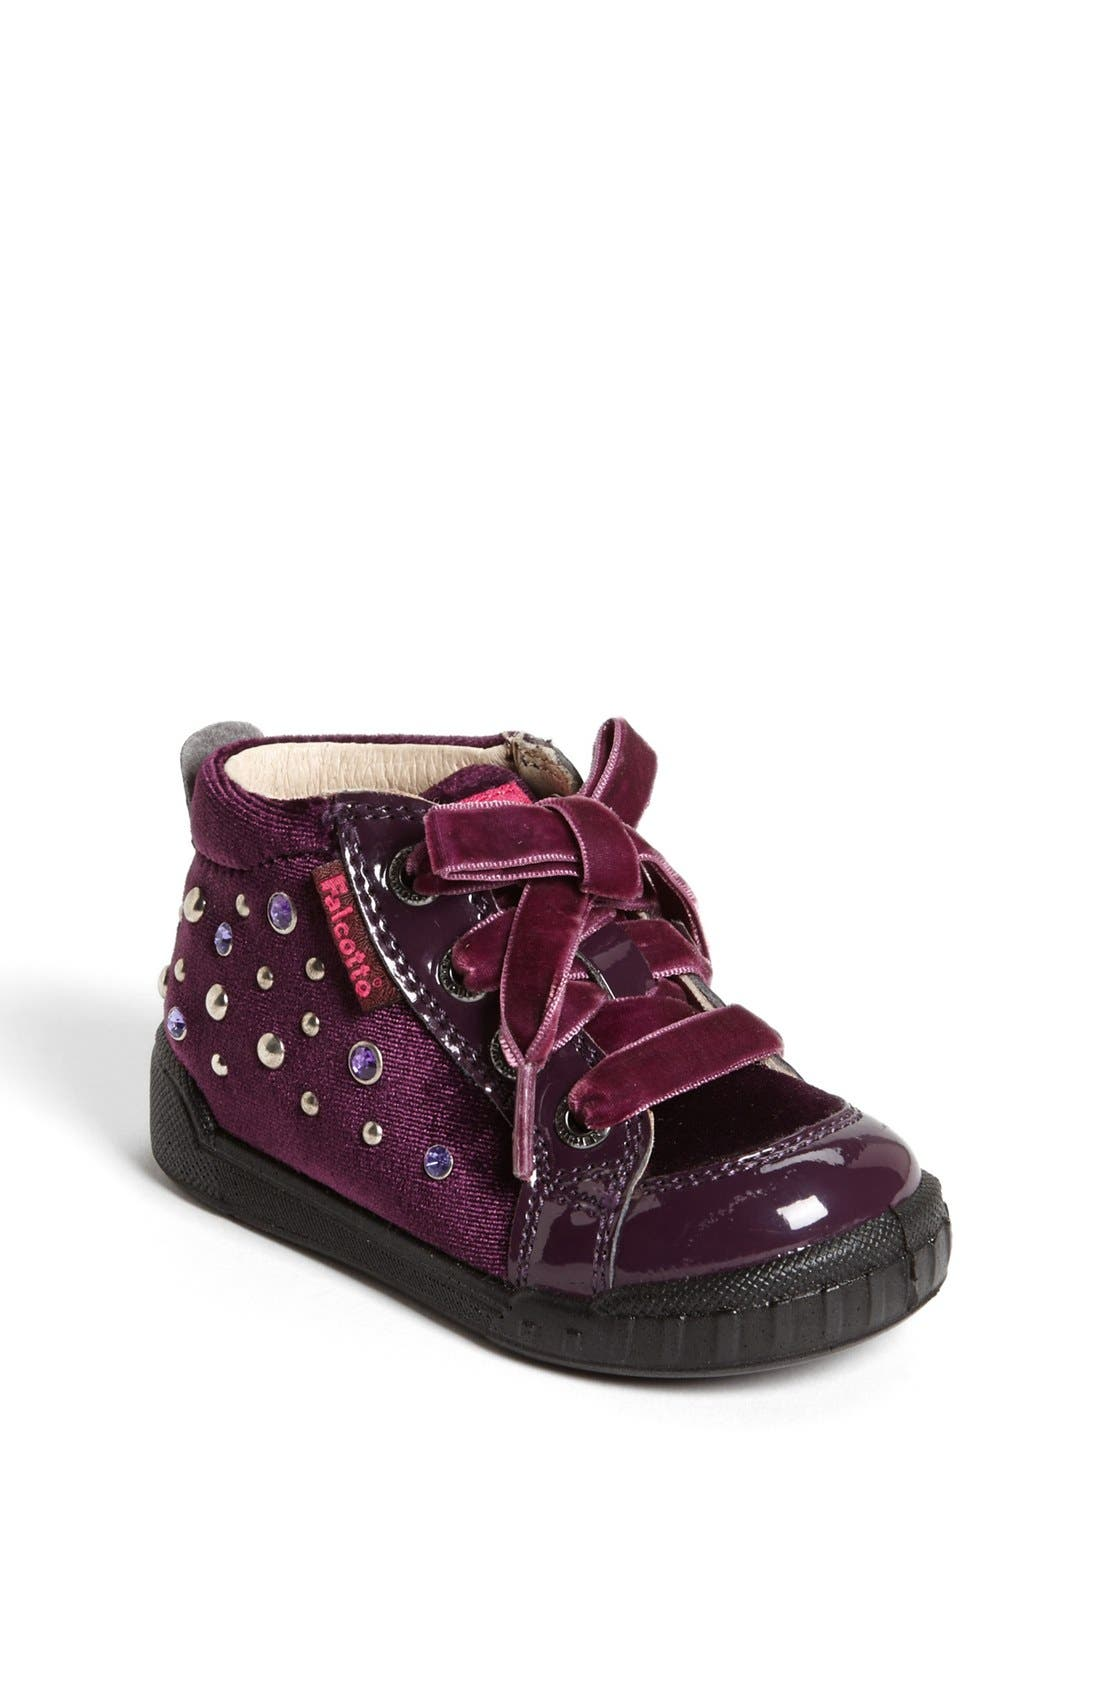 Main Image - Naturino 'Falcotto - 1203' Sneaker (Baby & Walker)